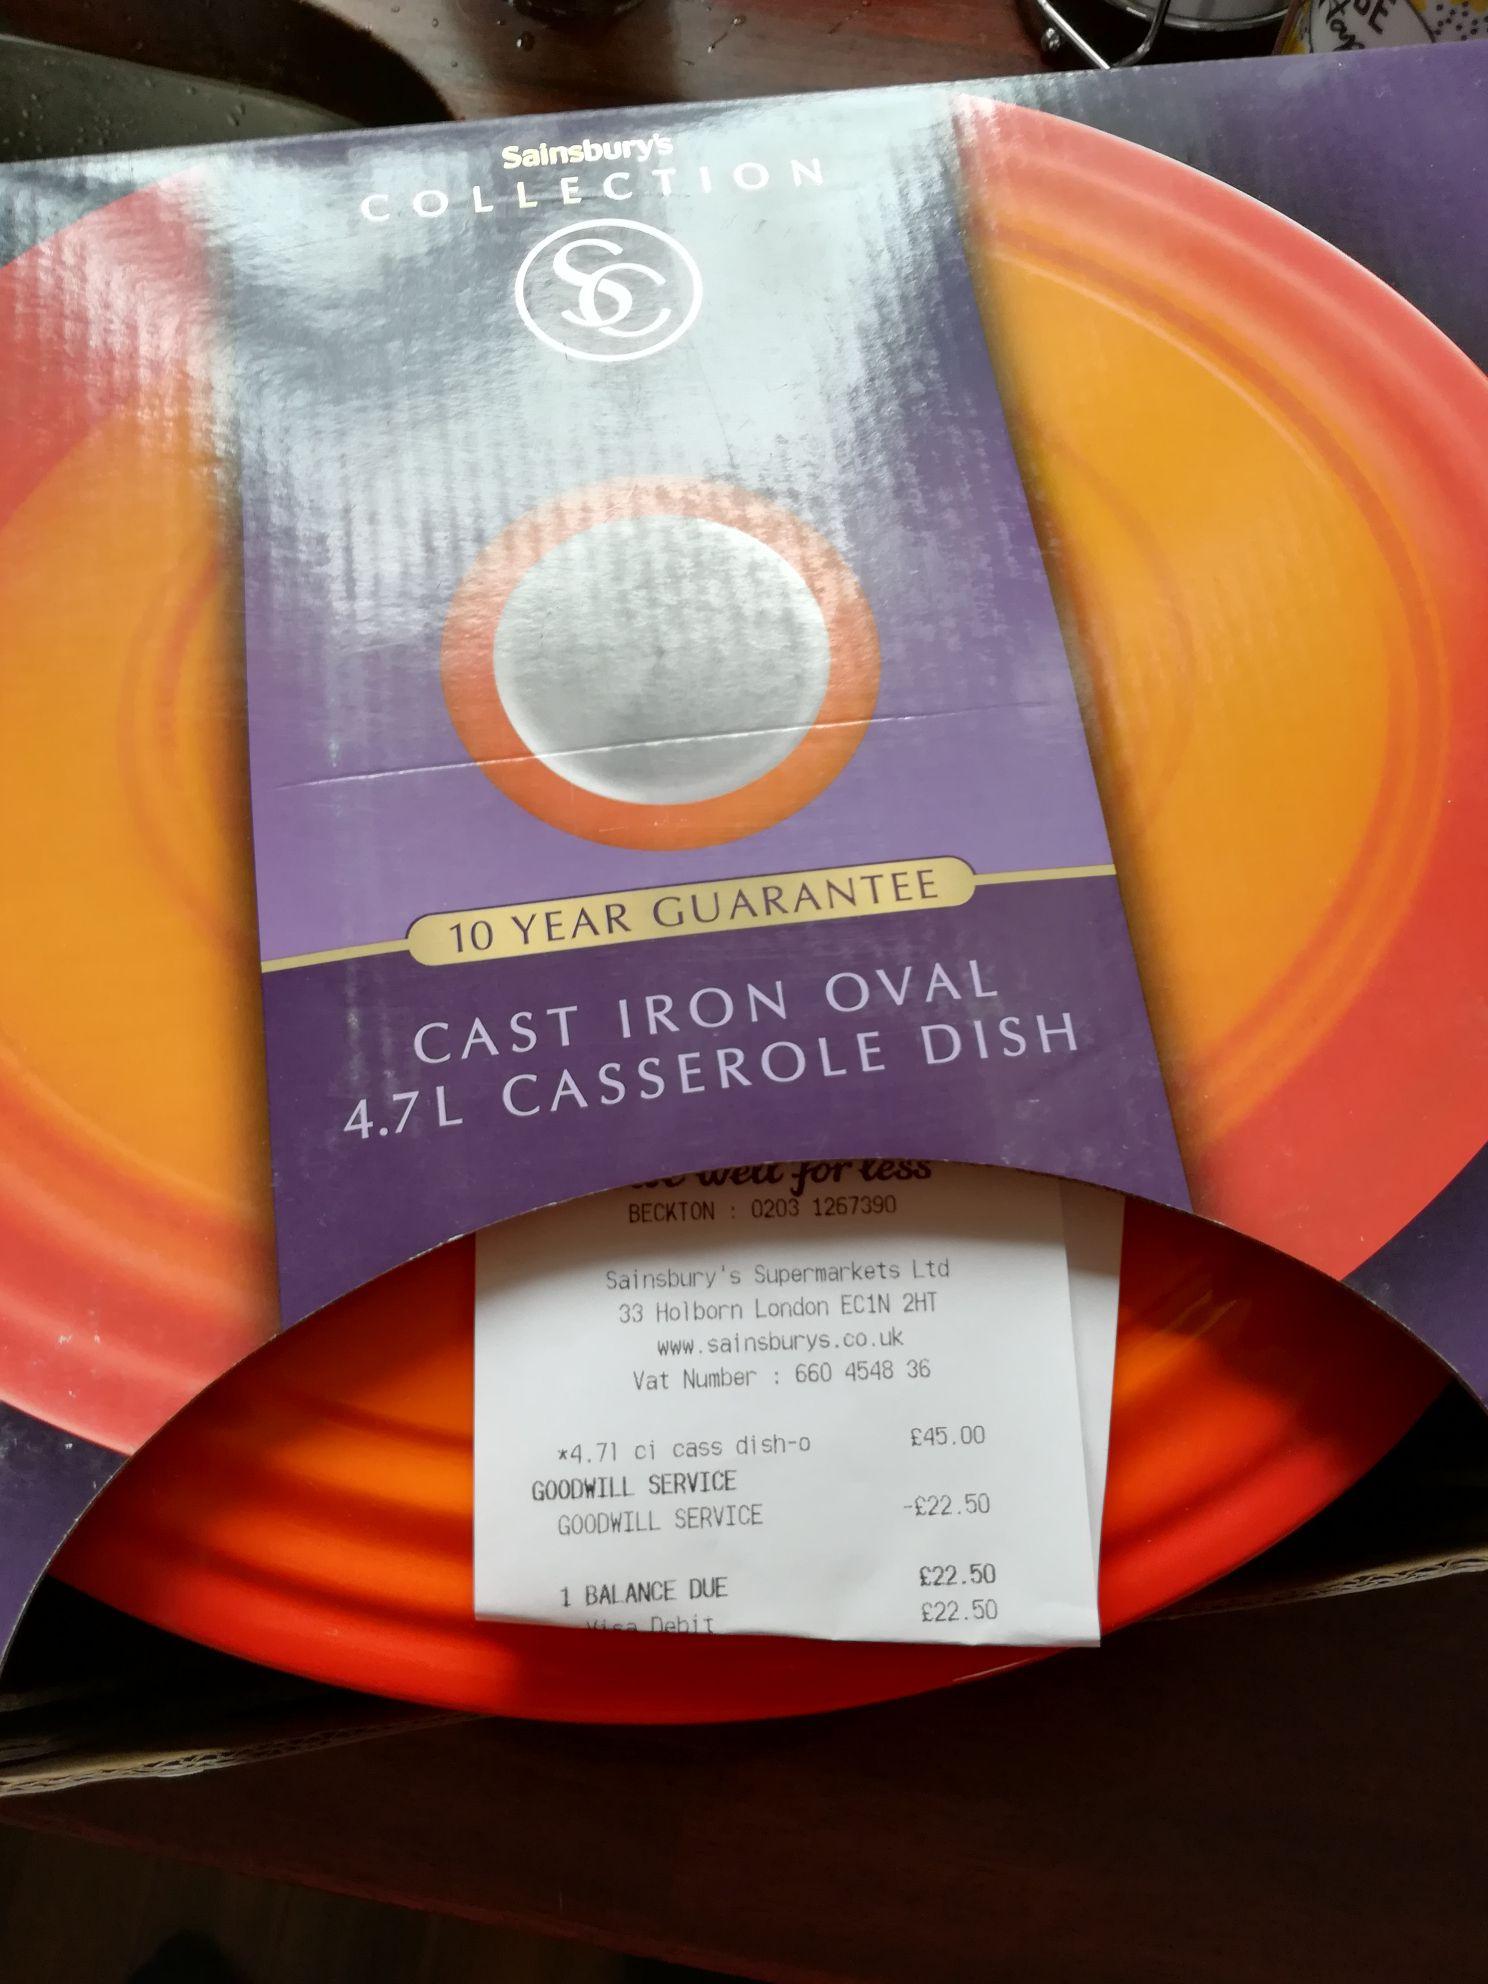 50% off Cast iron oval 4.7l casserole dish £22.50 Sainsbury's Beckton